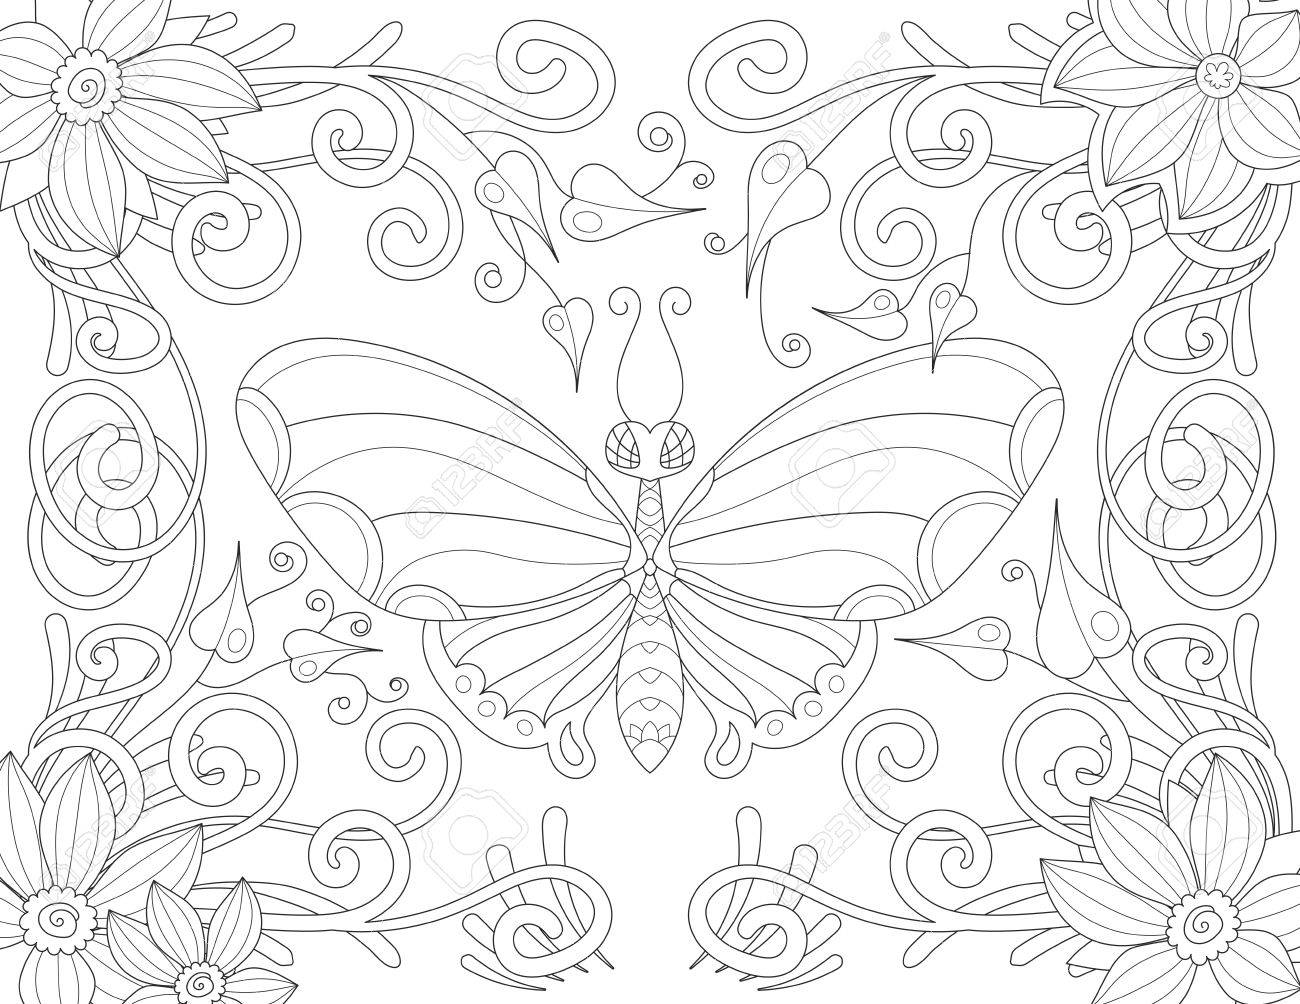 Único Mariposas Para Colorear Para Adultos Ornamento - Ideas Para ...